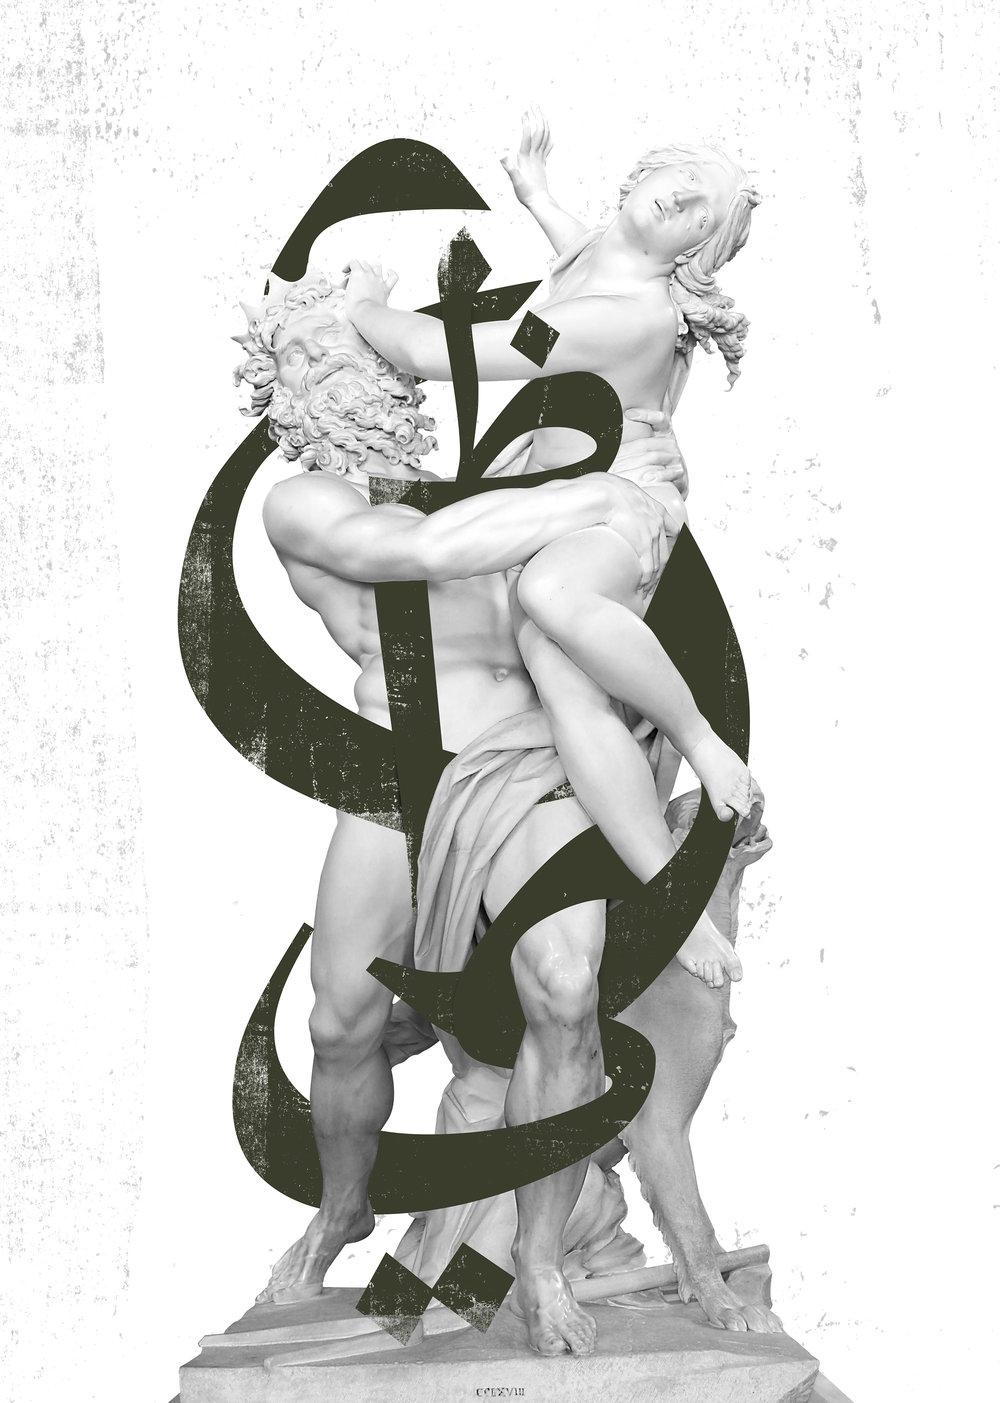 <b>Younes Zemmouri</b></br><i>Aïdari (Shame</i> series)</br>digital art print on archival paper</br>limited edition of 30</br>20 x 16 inches</br>$400 unframed / $600 framed